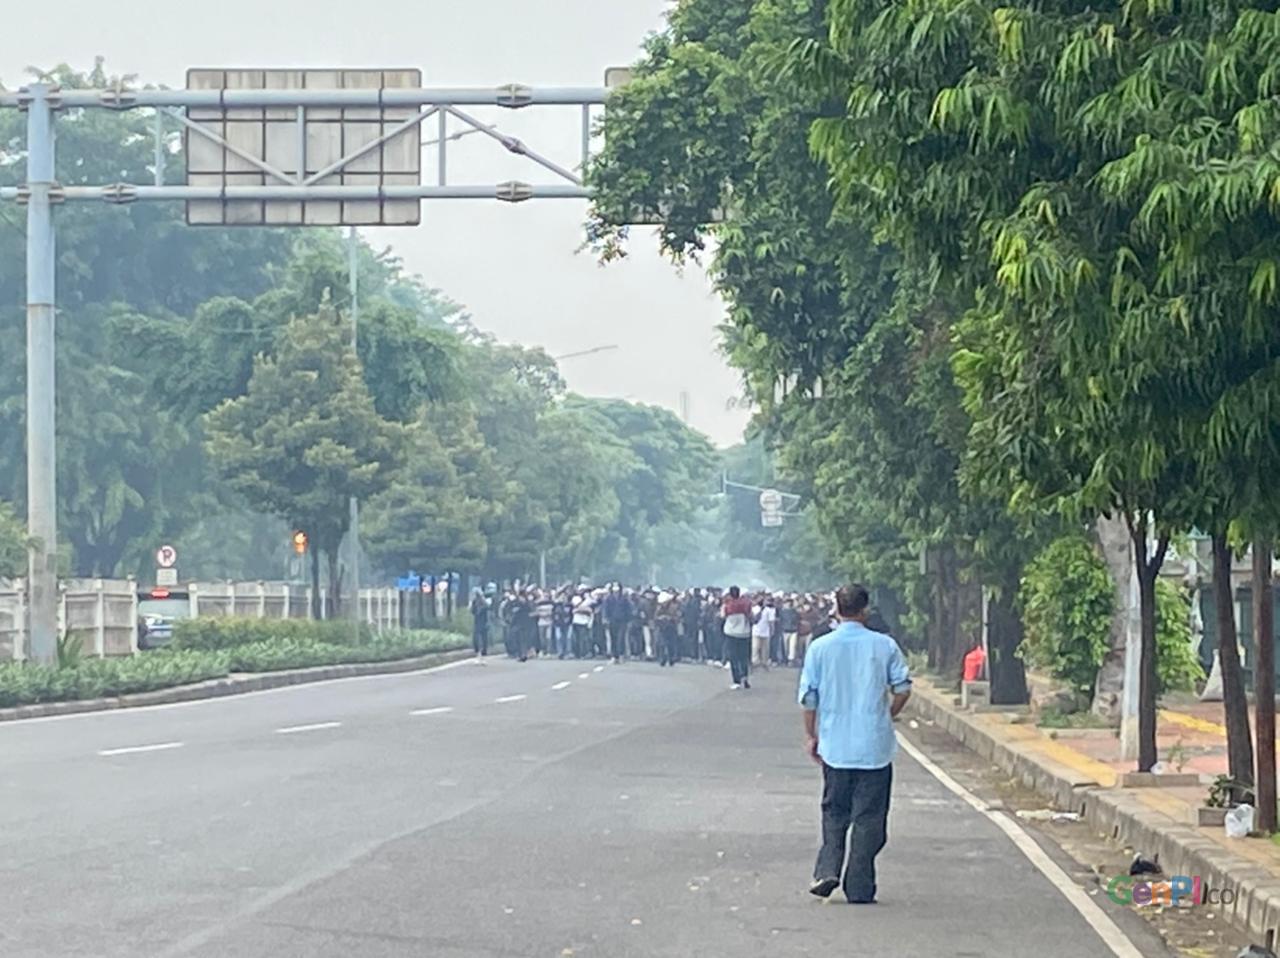 Massa yang yang diduga pendukung Rizieq bergerak di jalan I Gusti Ngurah Rai, Jakarta Timur. (Foto: Nje/GenPI.co)